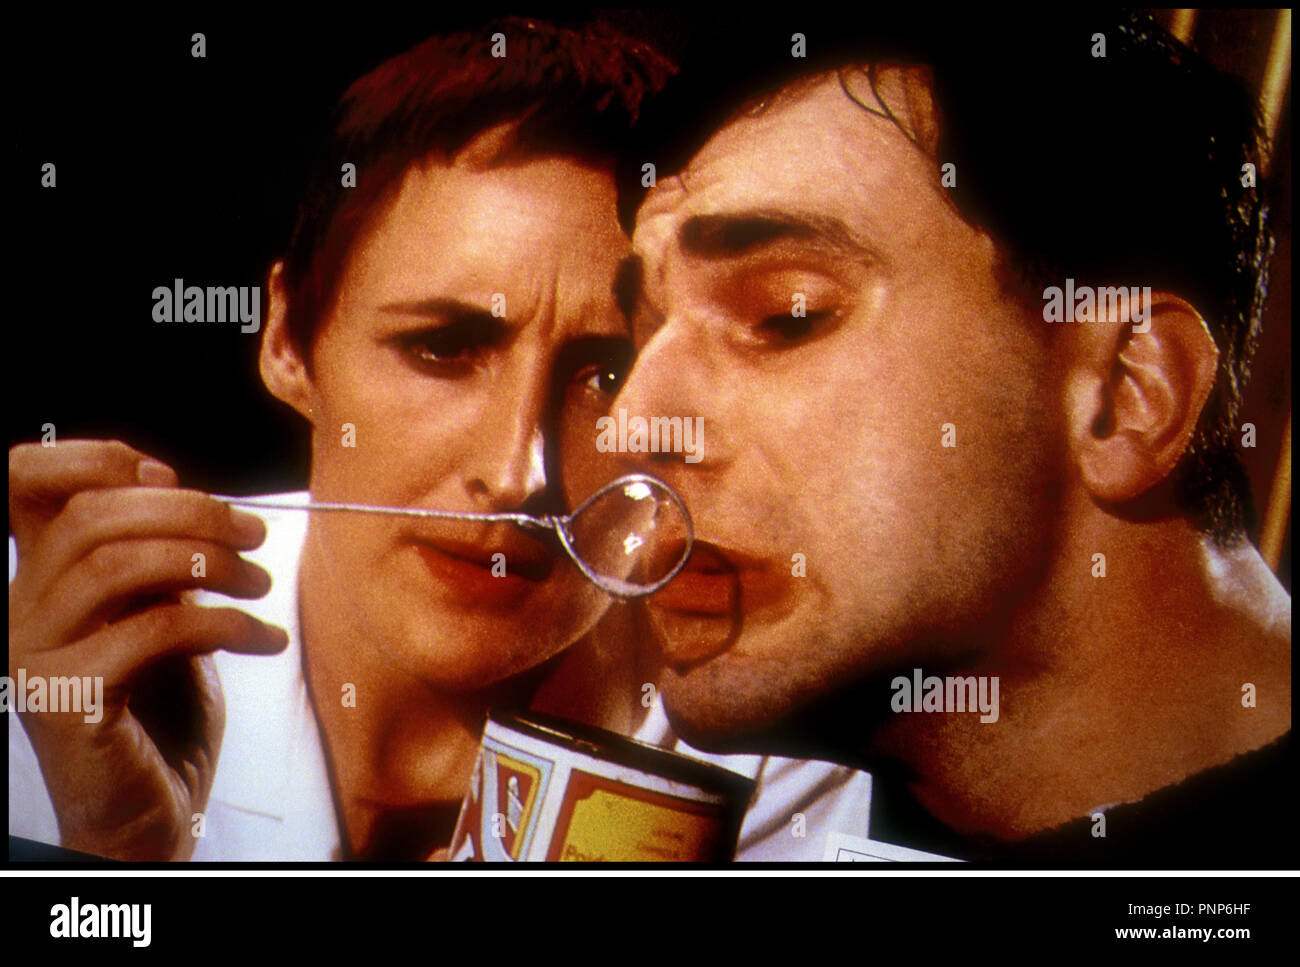 Prod DB © Ferndale - Granada / DR MY LEFT FOOT (MY LEFT FOOT) de Jim Sheridan 1989 GB / IRL avec Daniel Day-Lewis  d'aprs le roman de Christy Brown - Stock Image